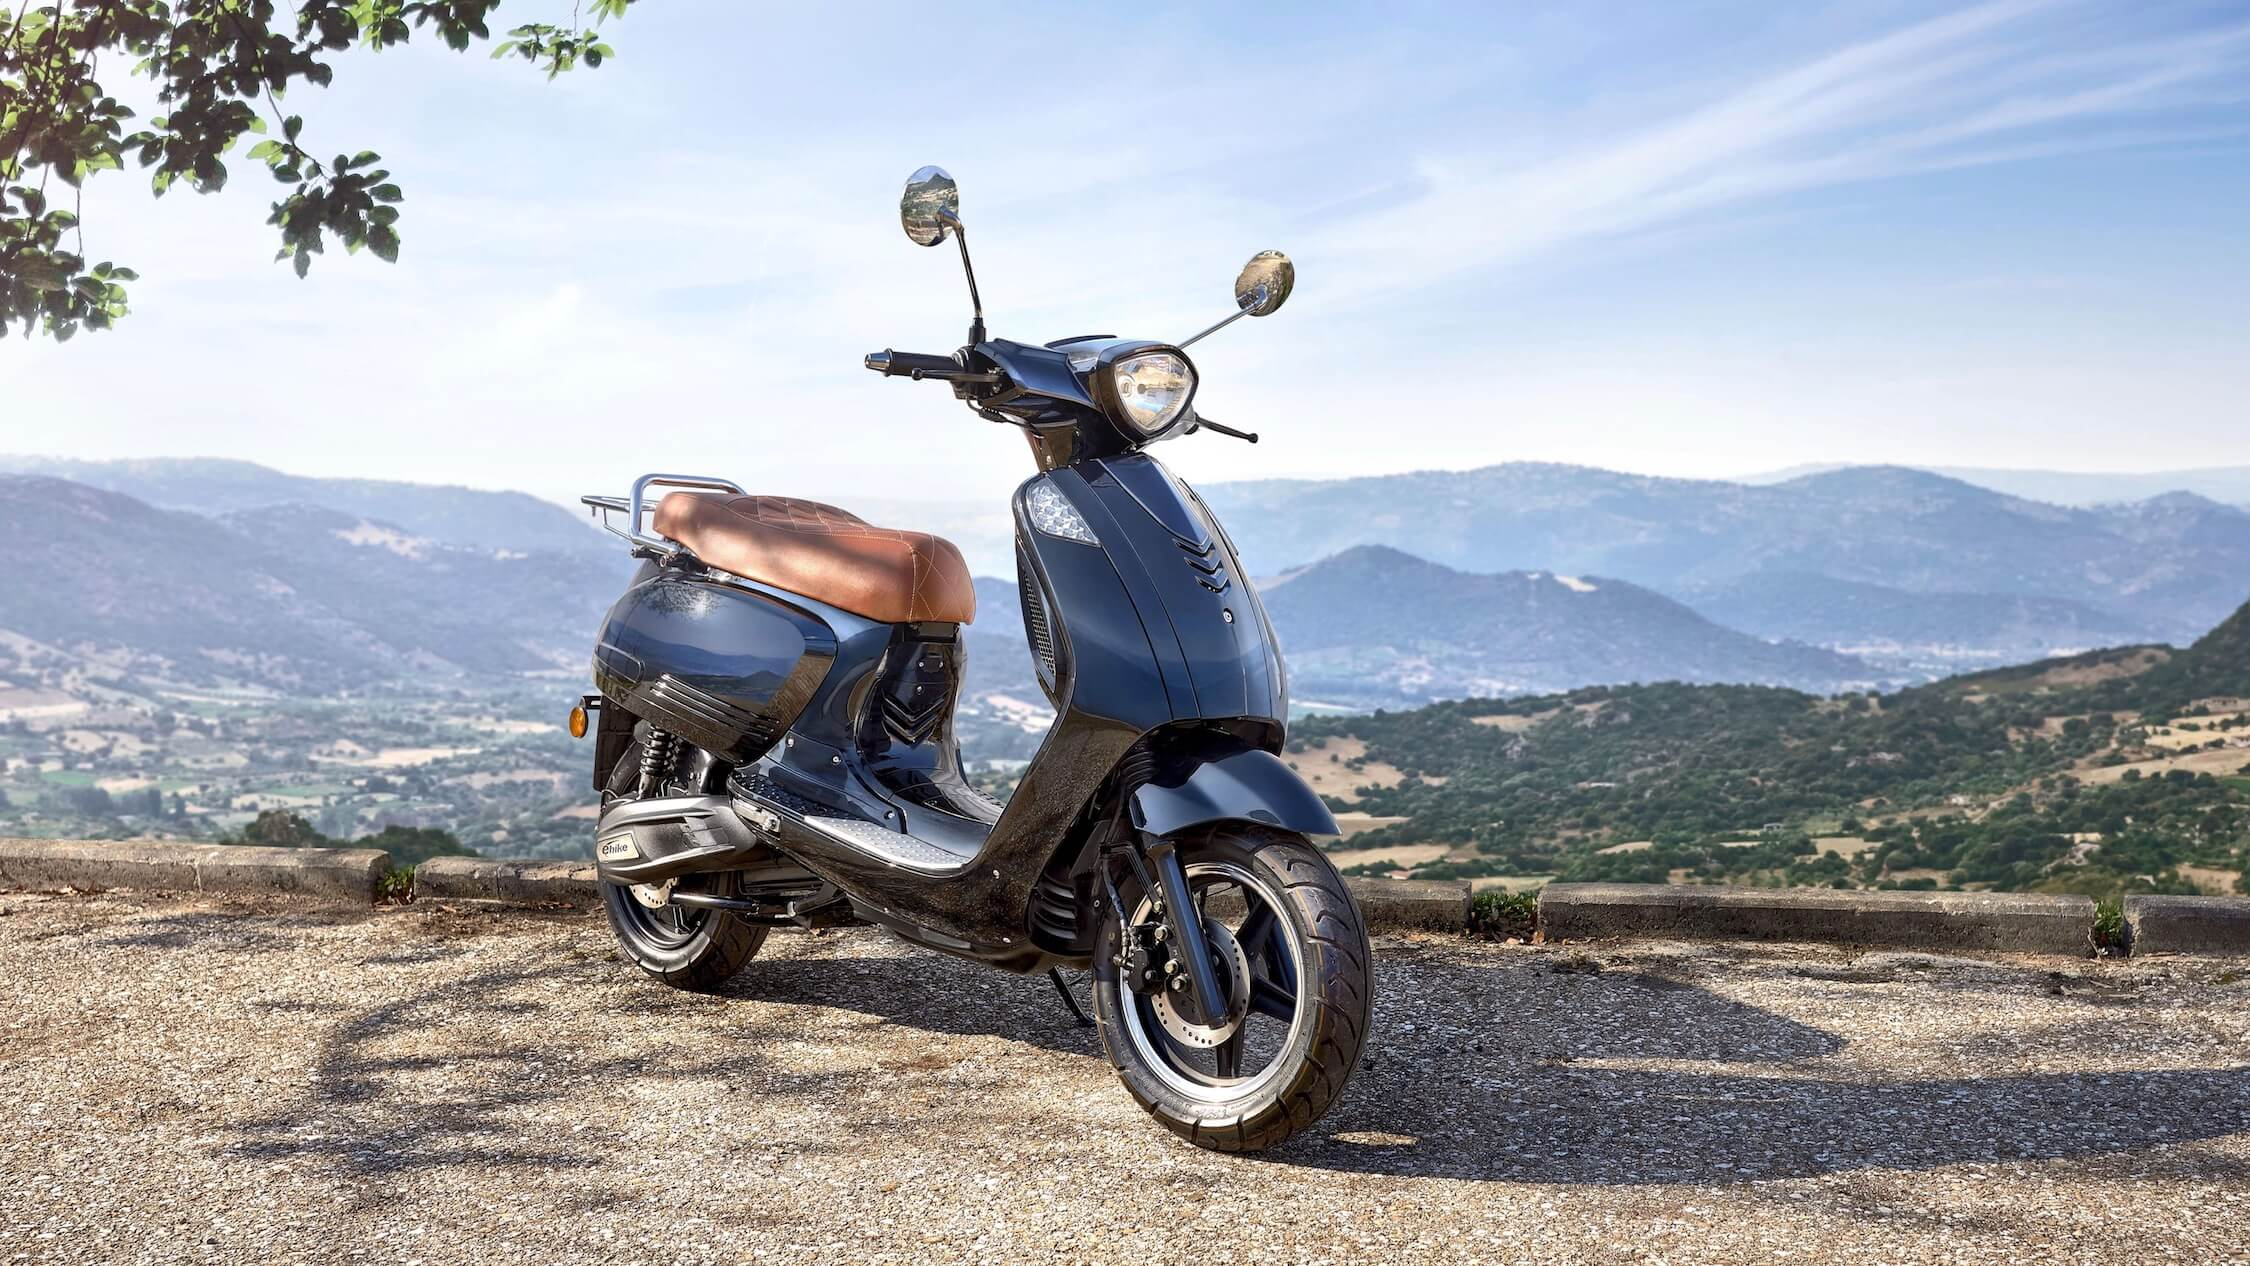 KSR Moto Vionis elektrische scooter